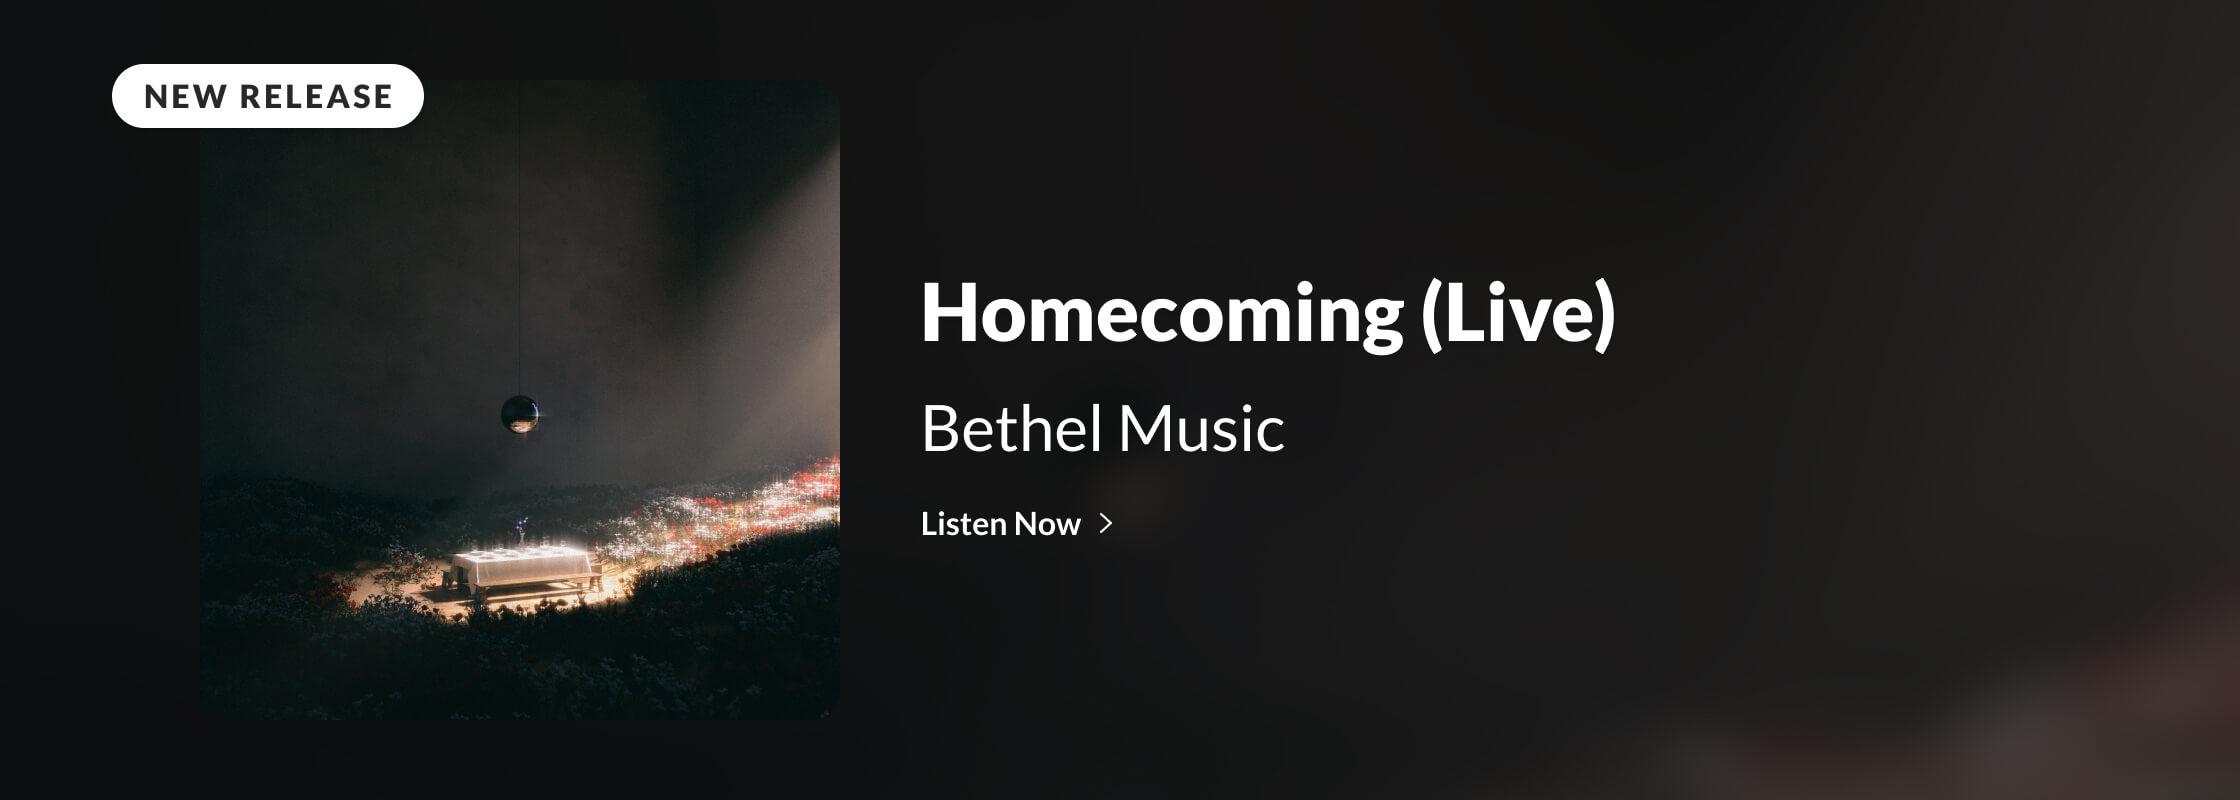 Bethel Music | Homecoming